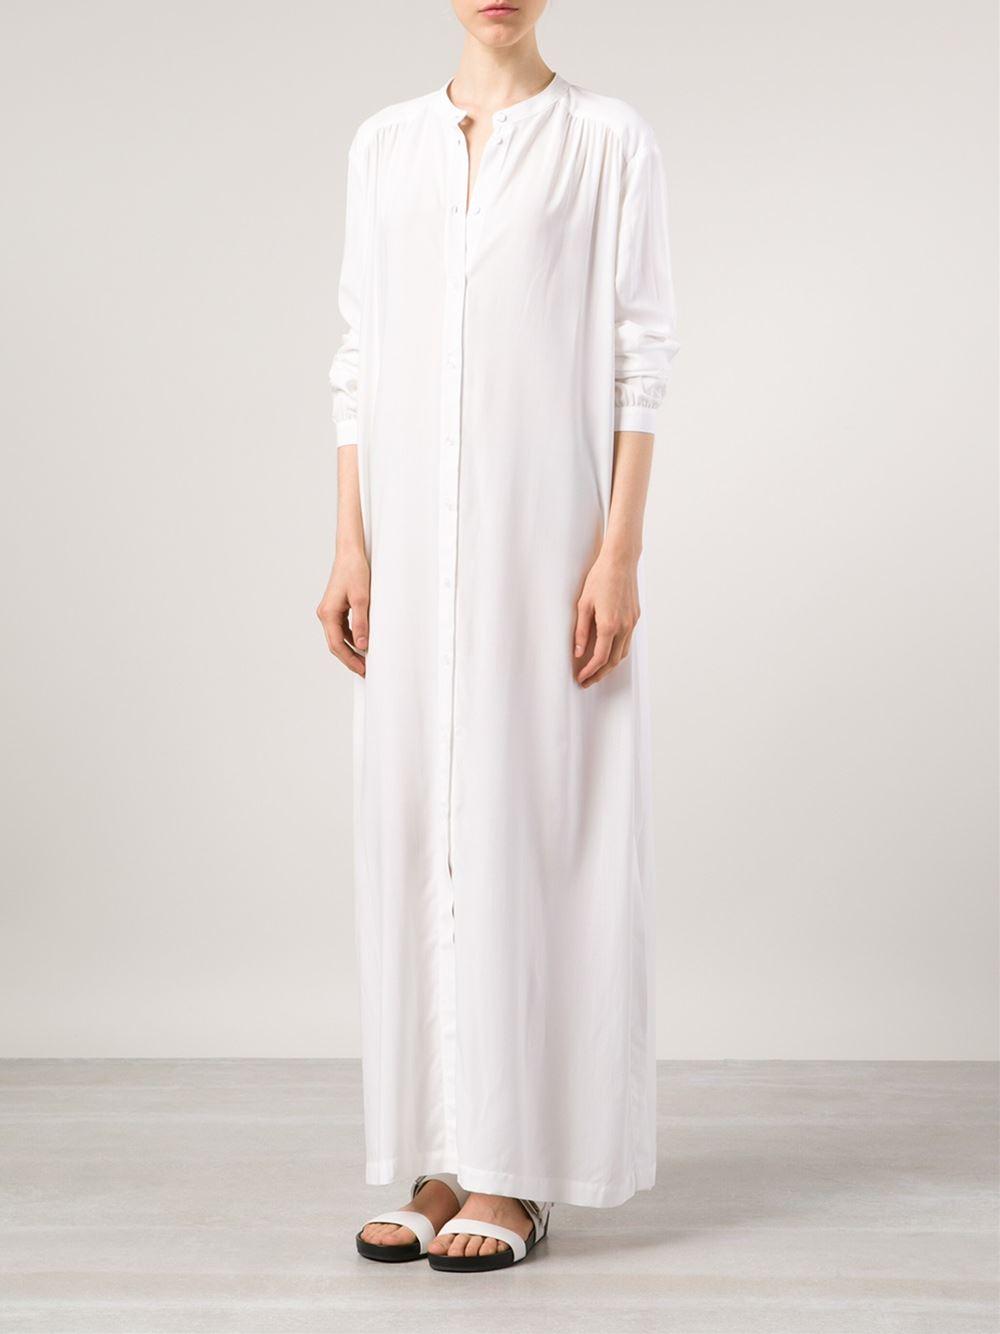 Lyst Rodebjer Long Shirt Dress In White